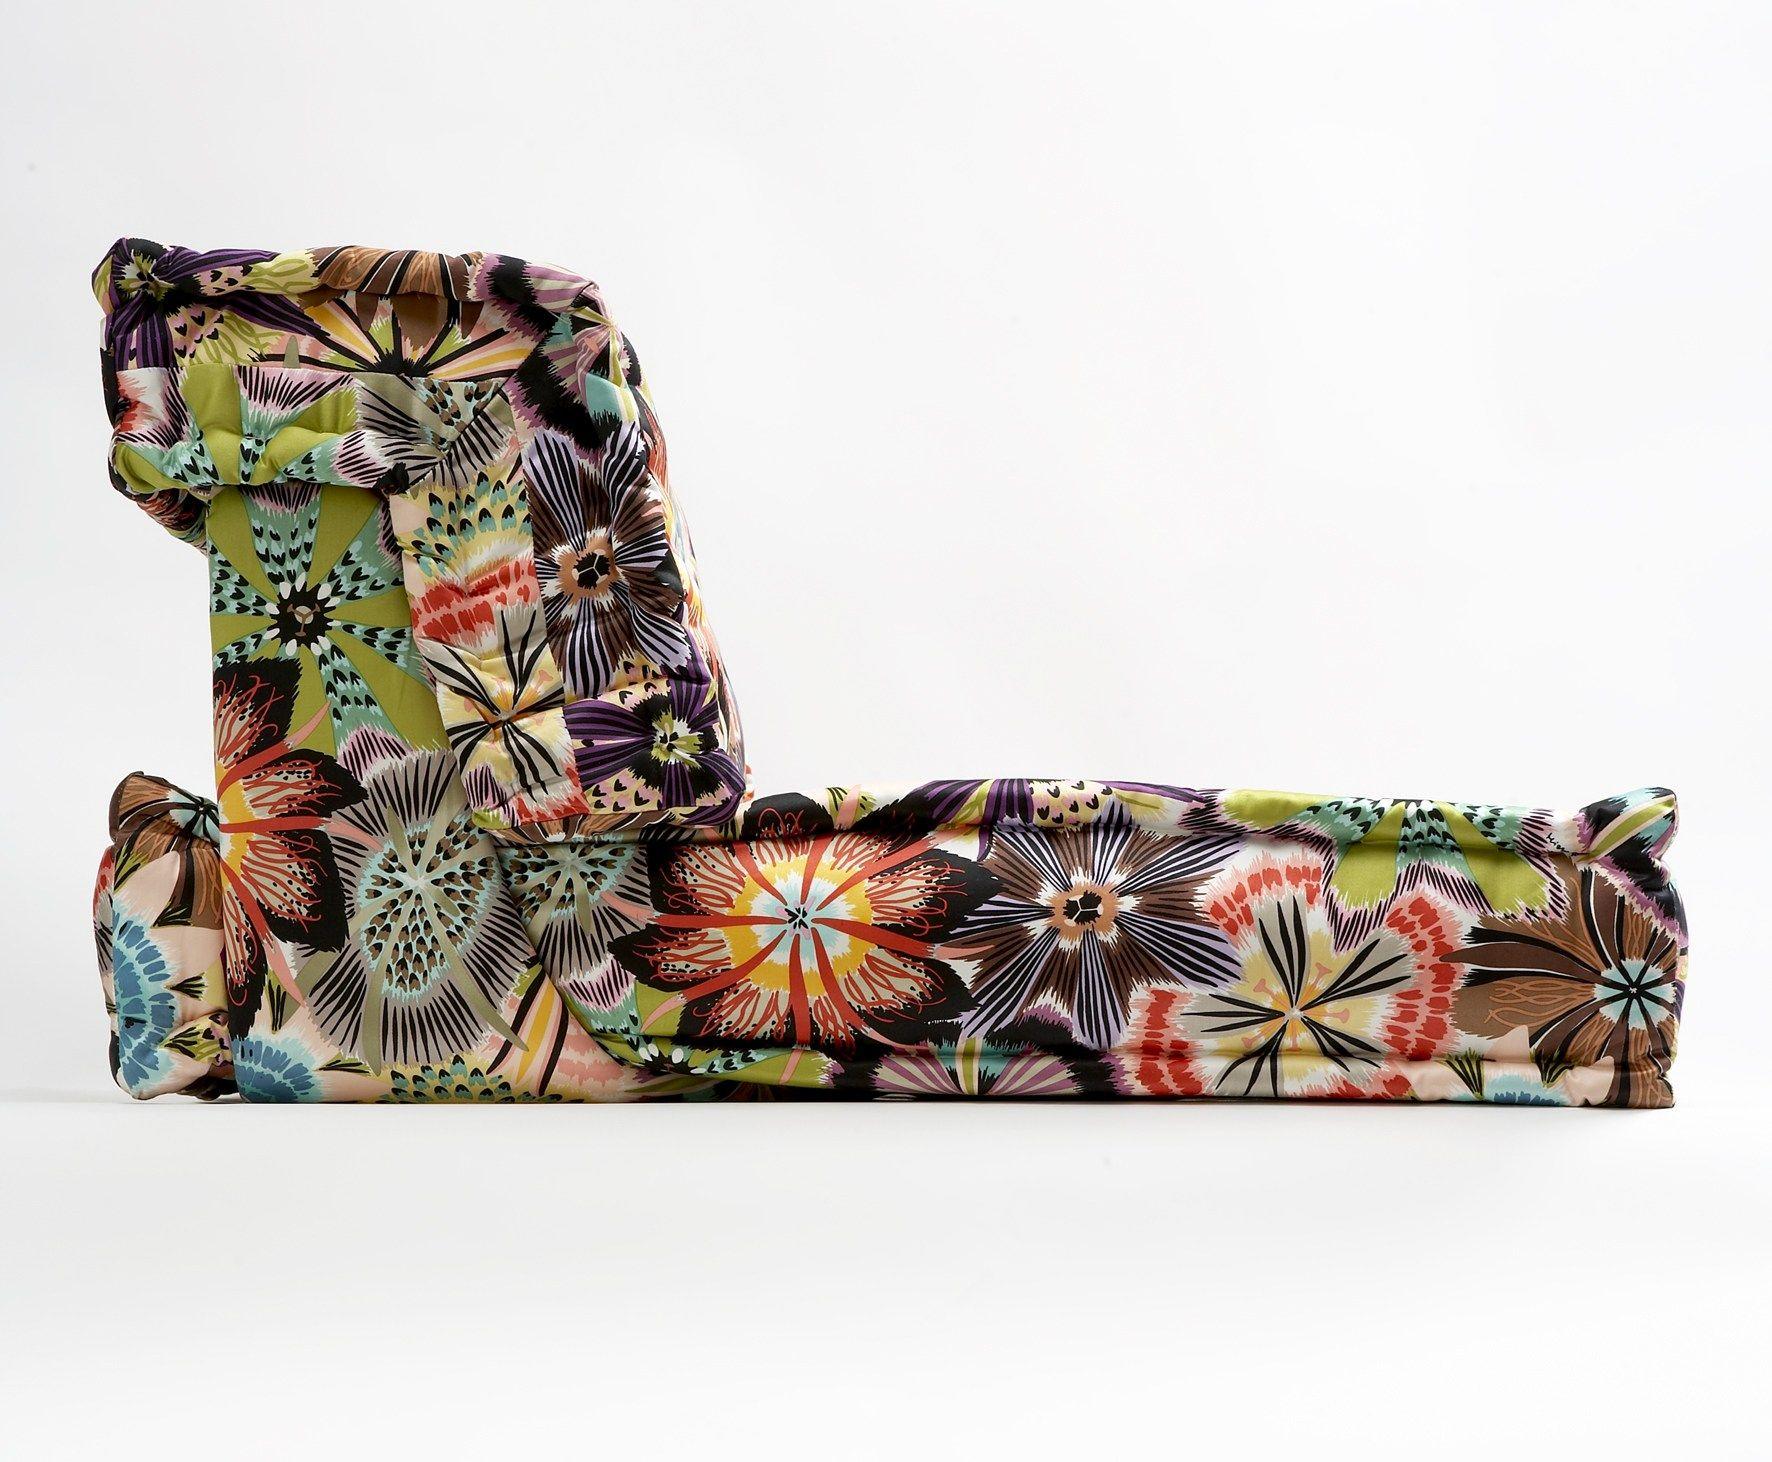 Chair Cushions 19 X 19 picture on les contemporains sectional fabric sofa mah jong missoni home roche bobois with Chair Cushions 19 X 19, sofa 6035ba3e25a2542367fefd6c6945ac9d